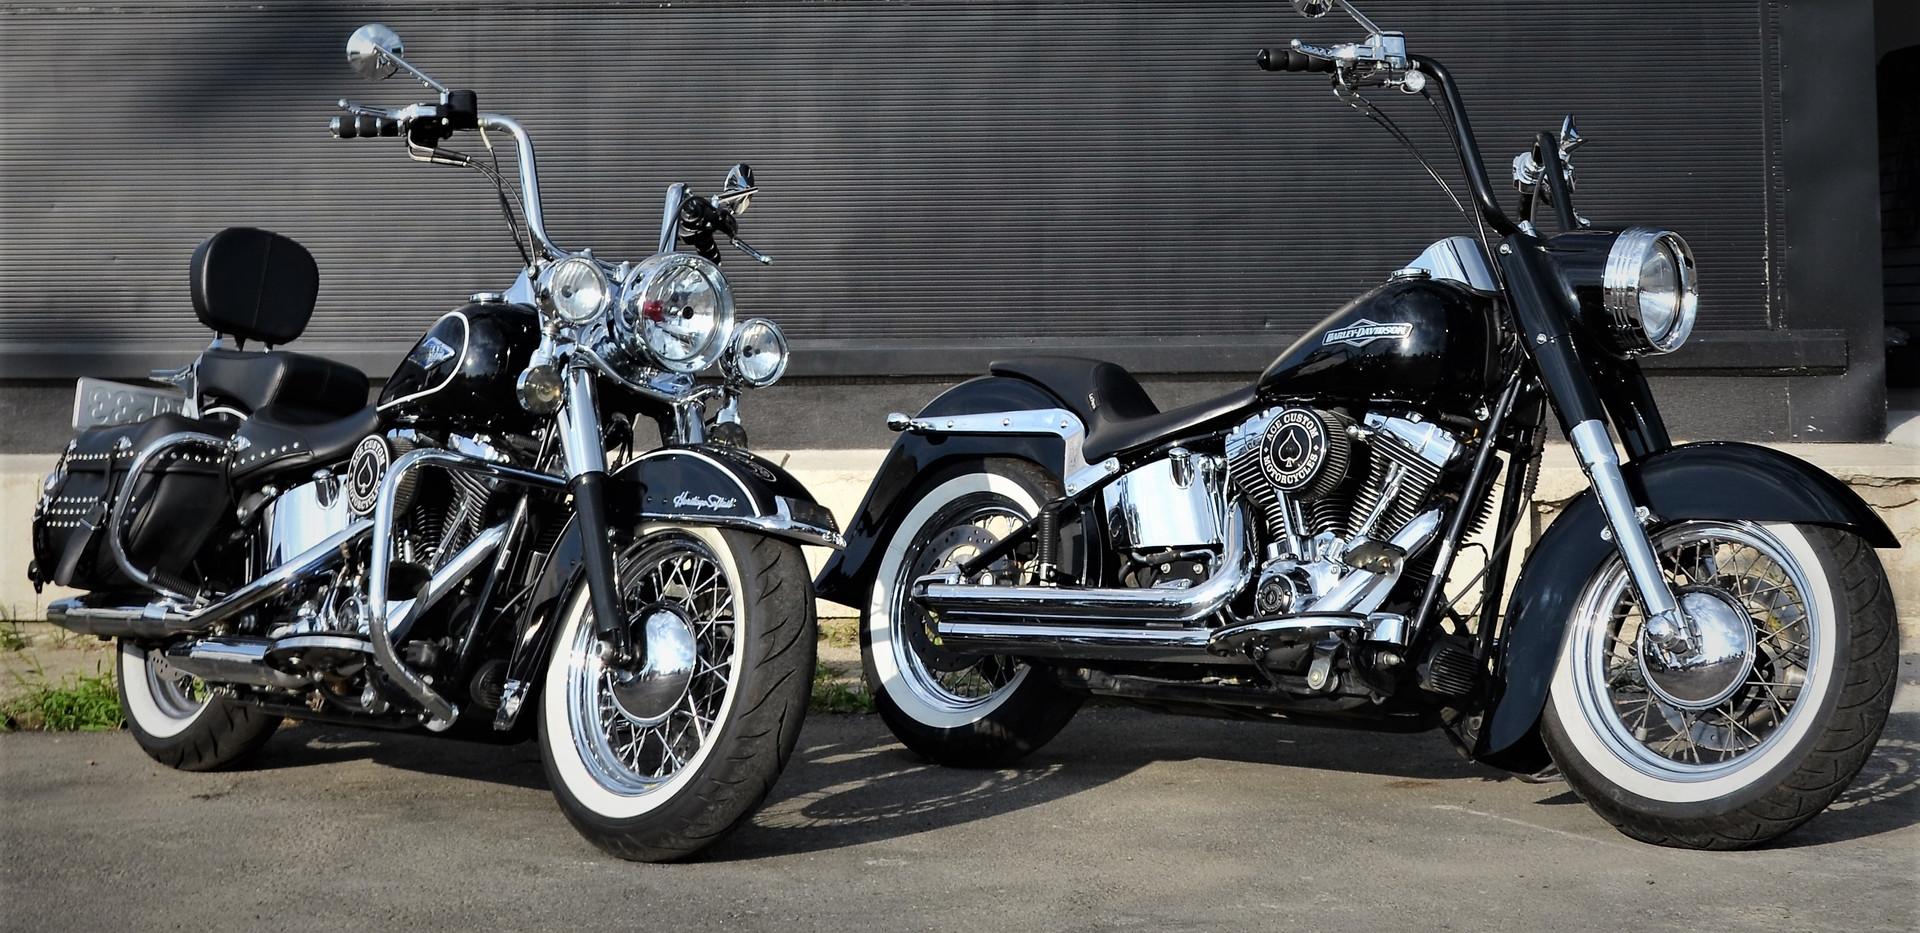 Harley Davidson Softail Heritage Gangsta 5